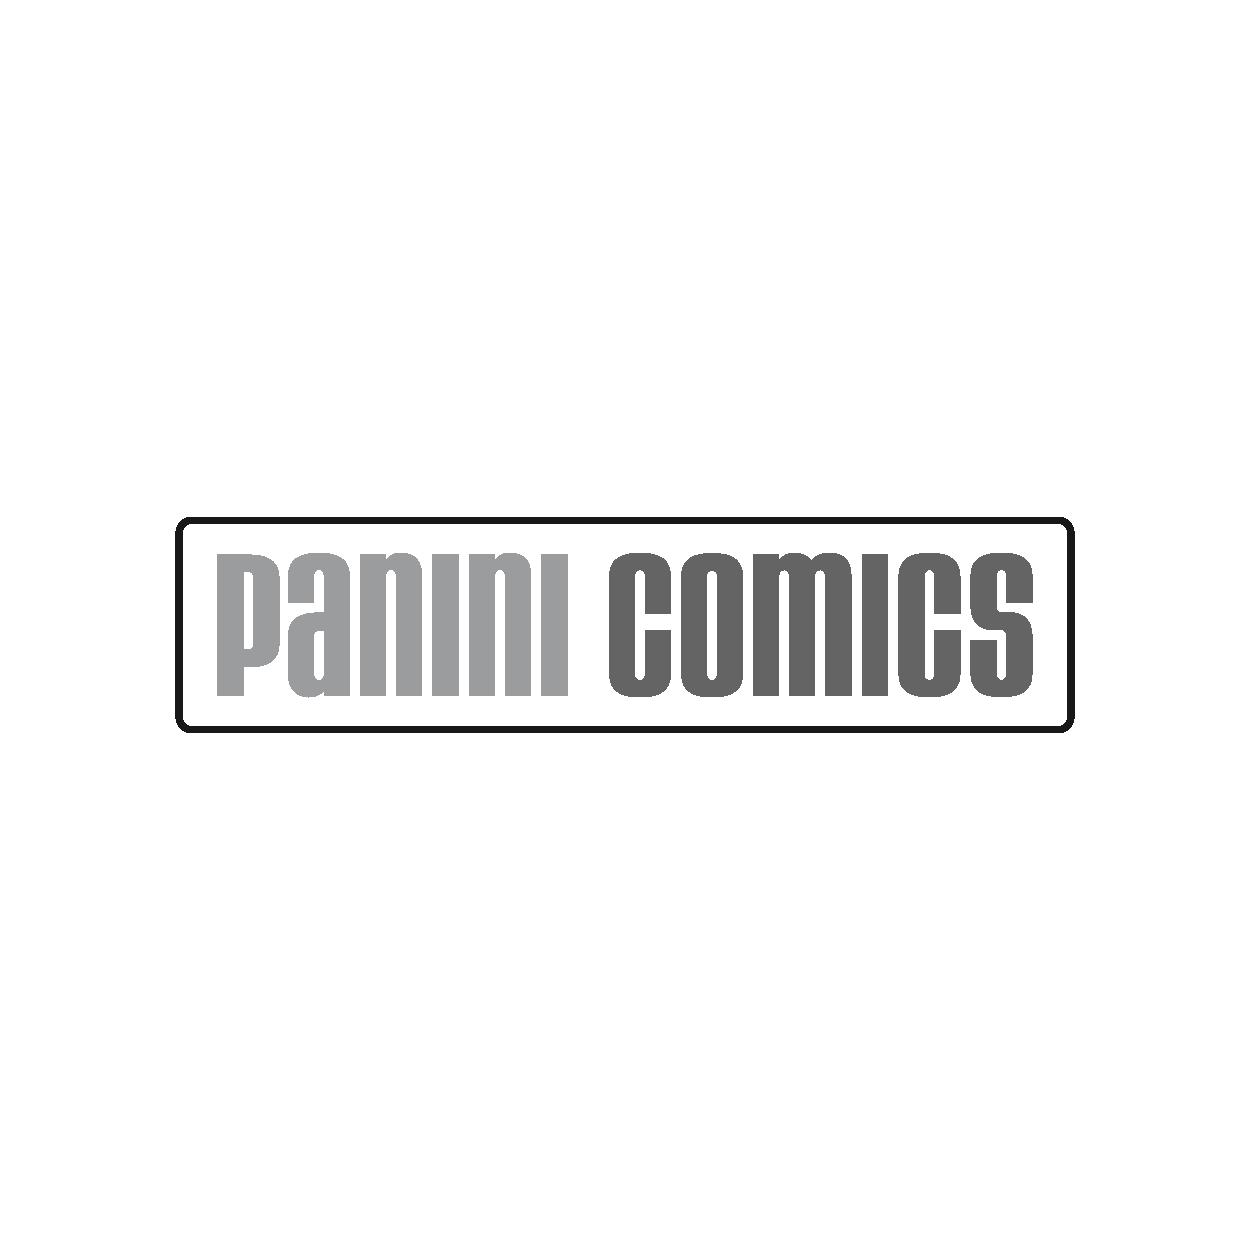 logo_Panini_Comics.png